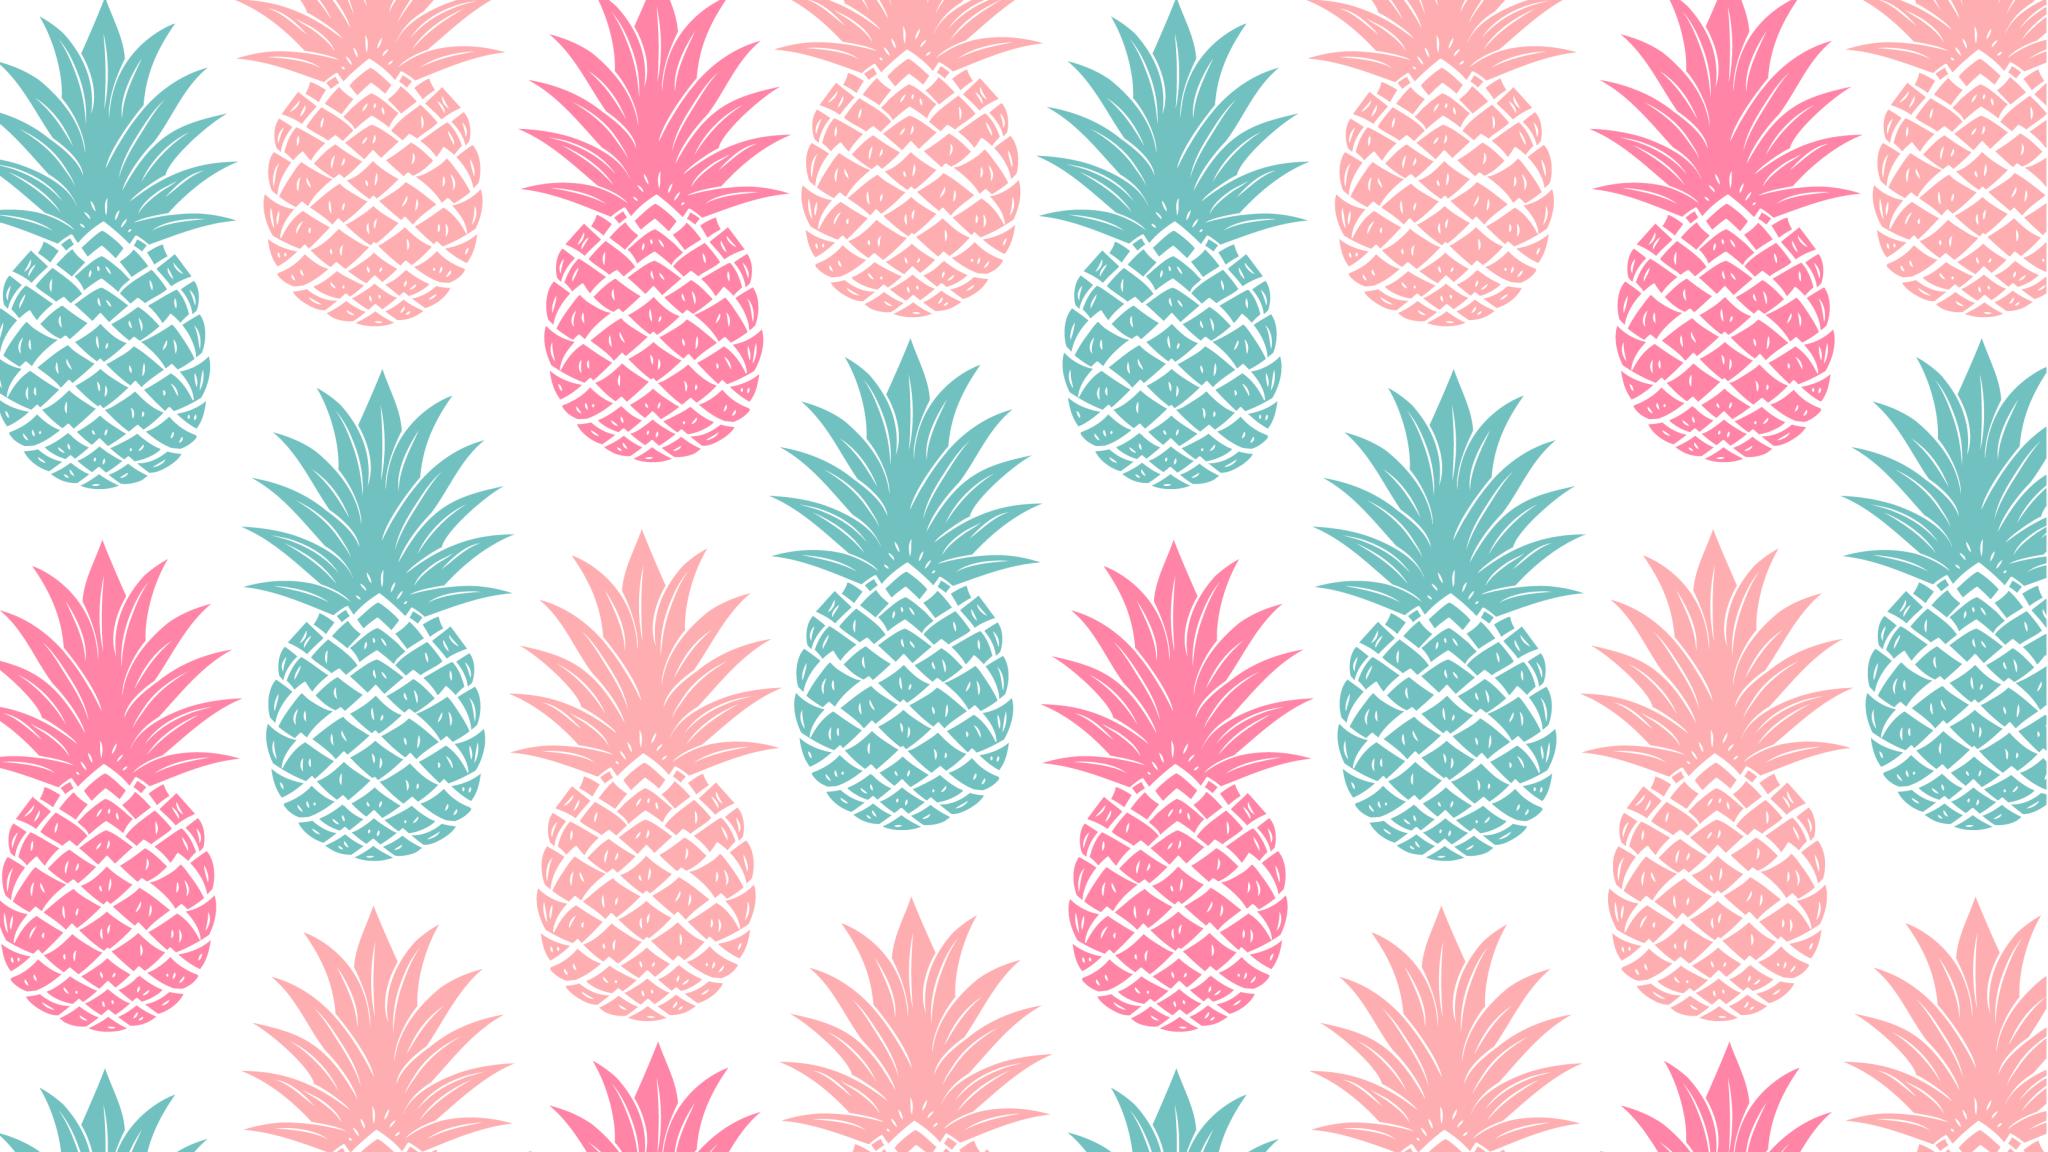 Dressupyourtech Pineapple Wallpaper 2048x1152 Wallpapers Youtube Banner Backgrounds